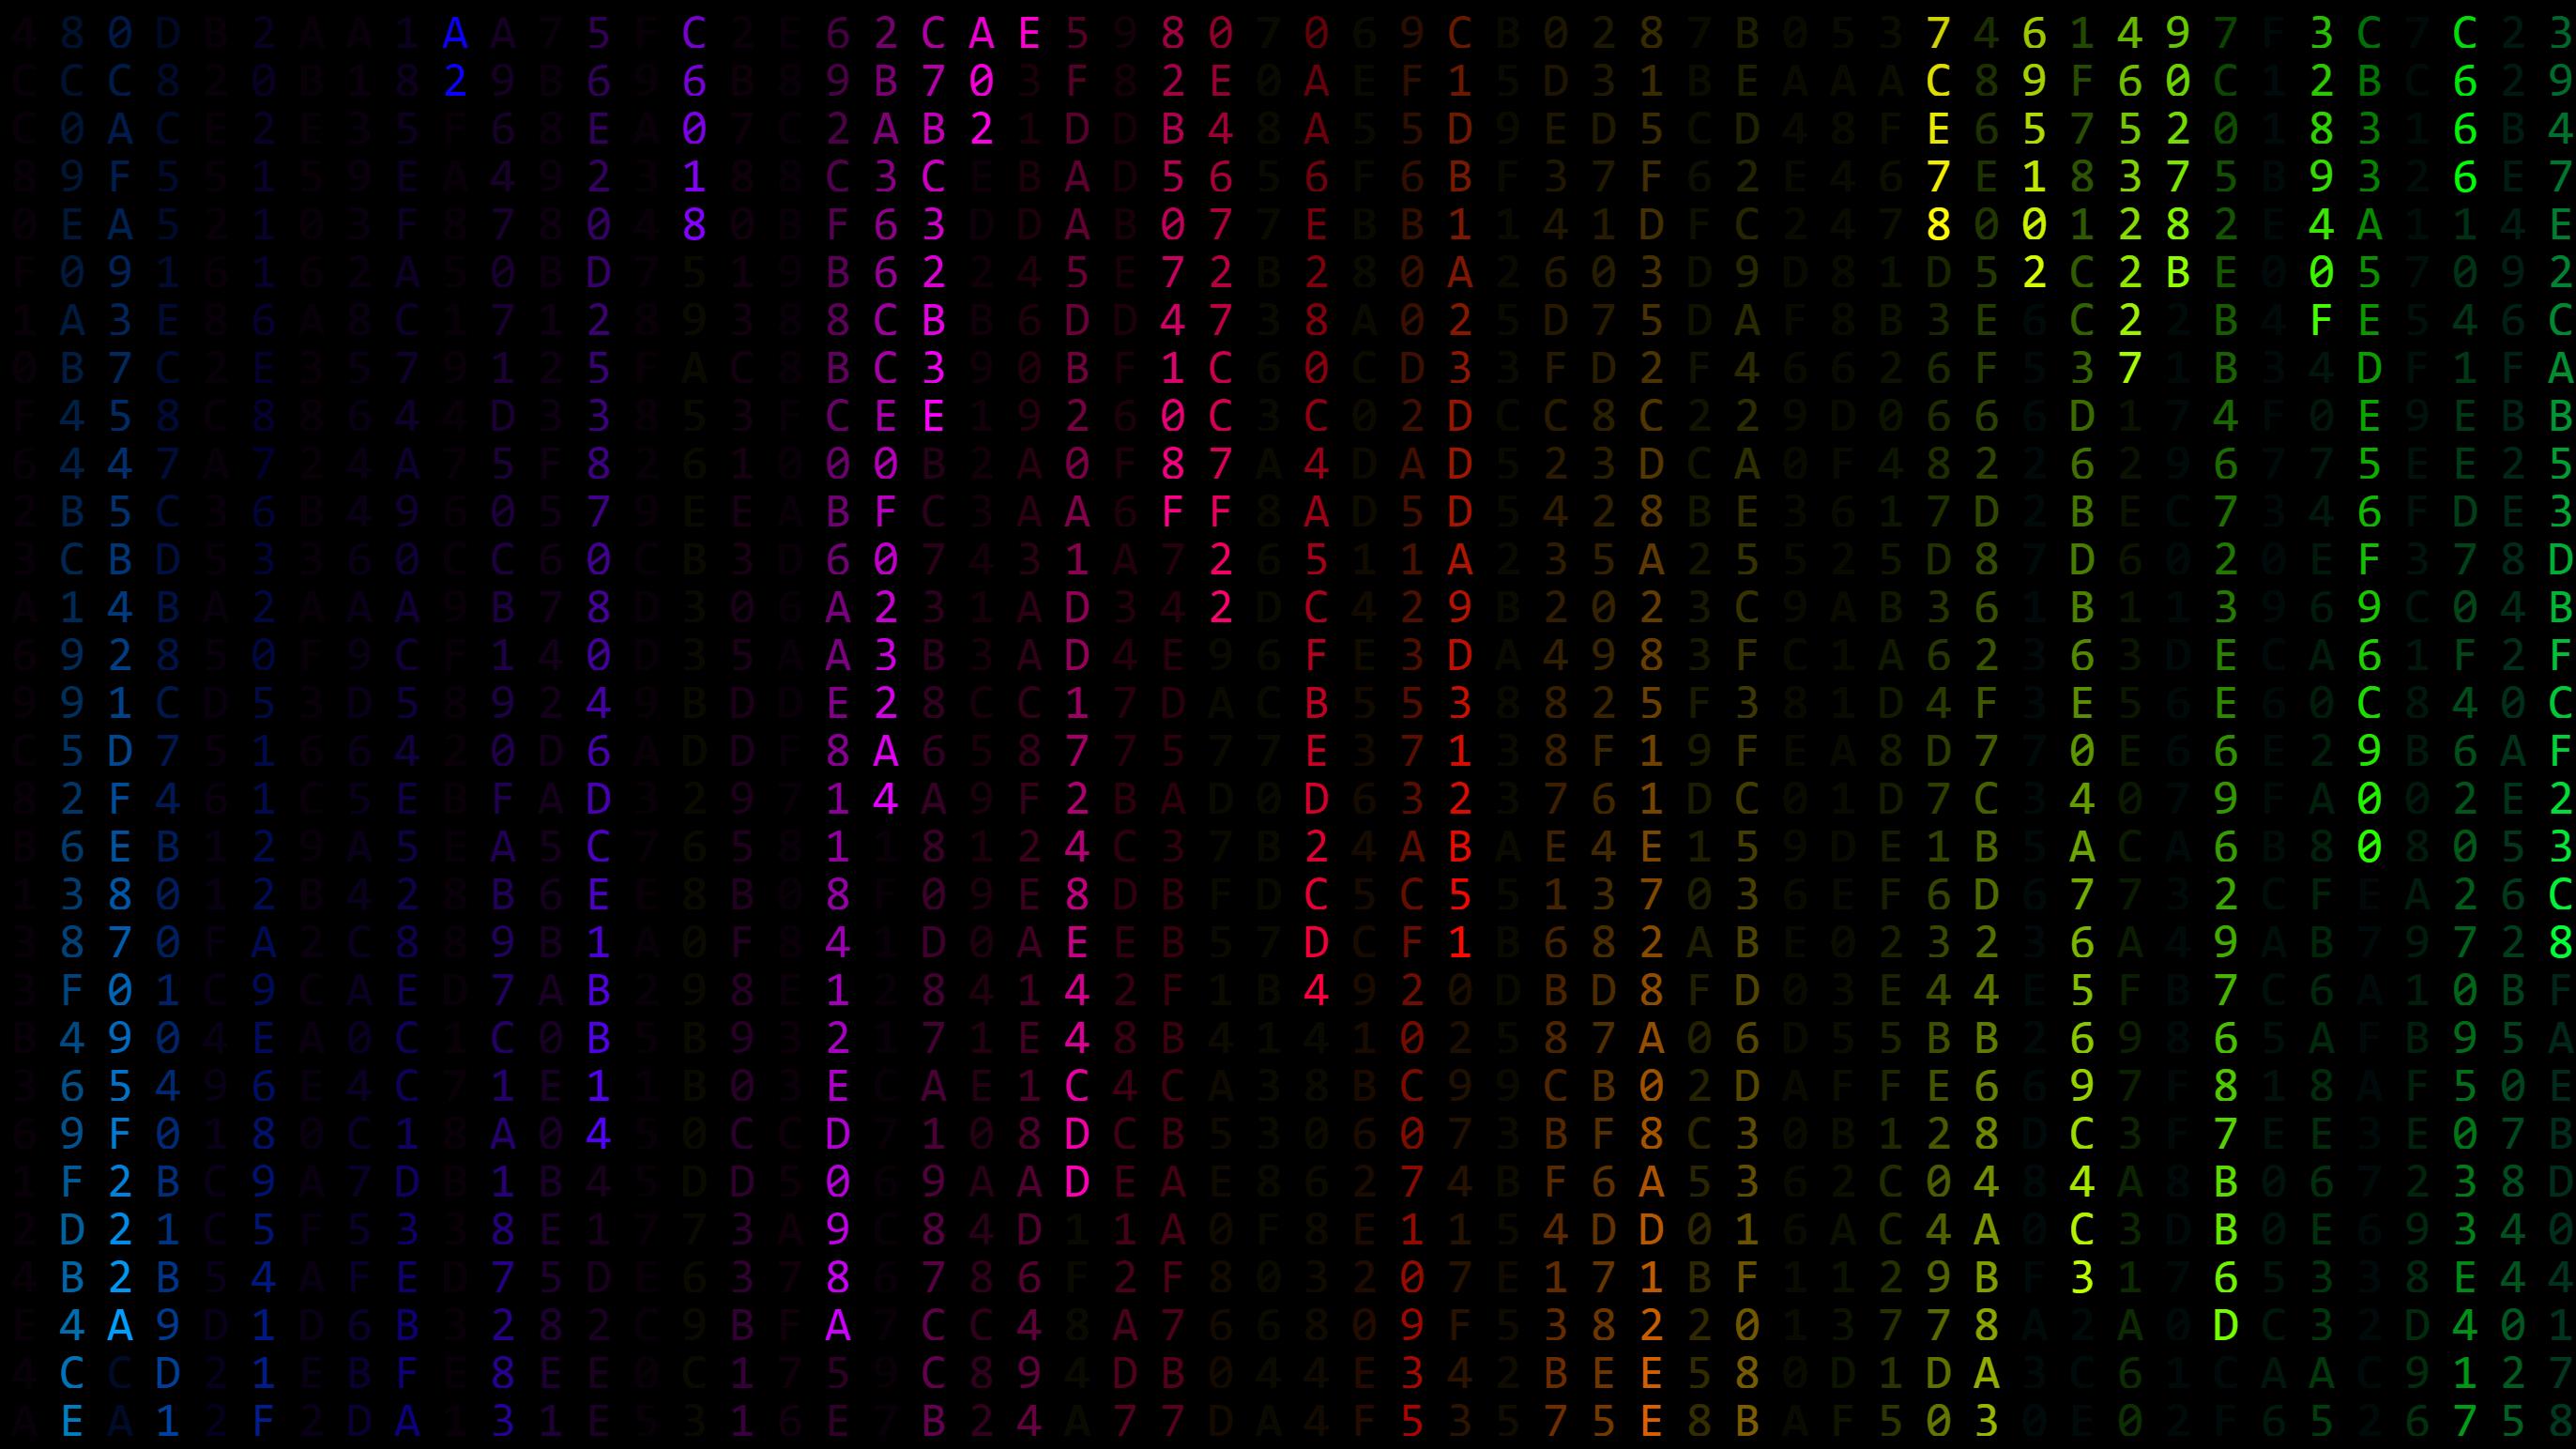 Wallpaper Engine - Colorful Matrix